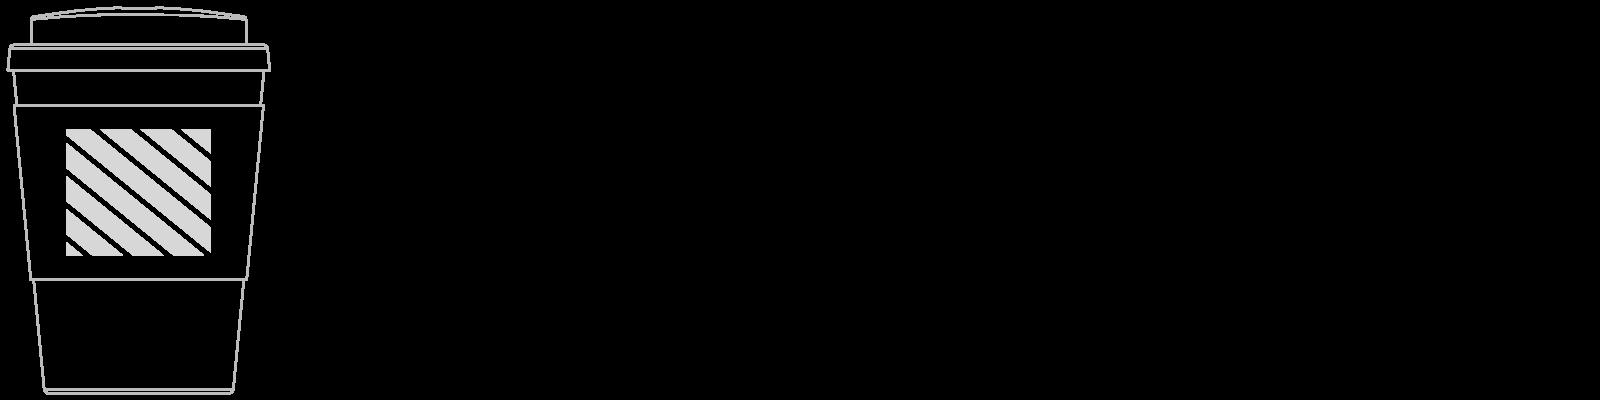 Resemugg Screentryck